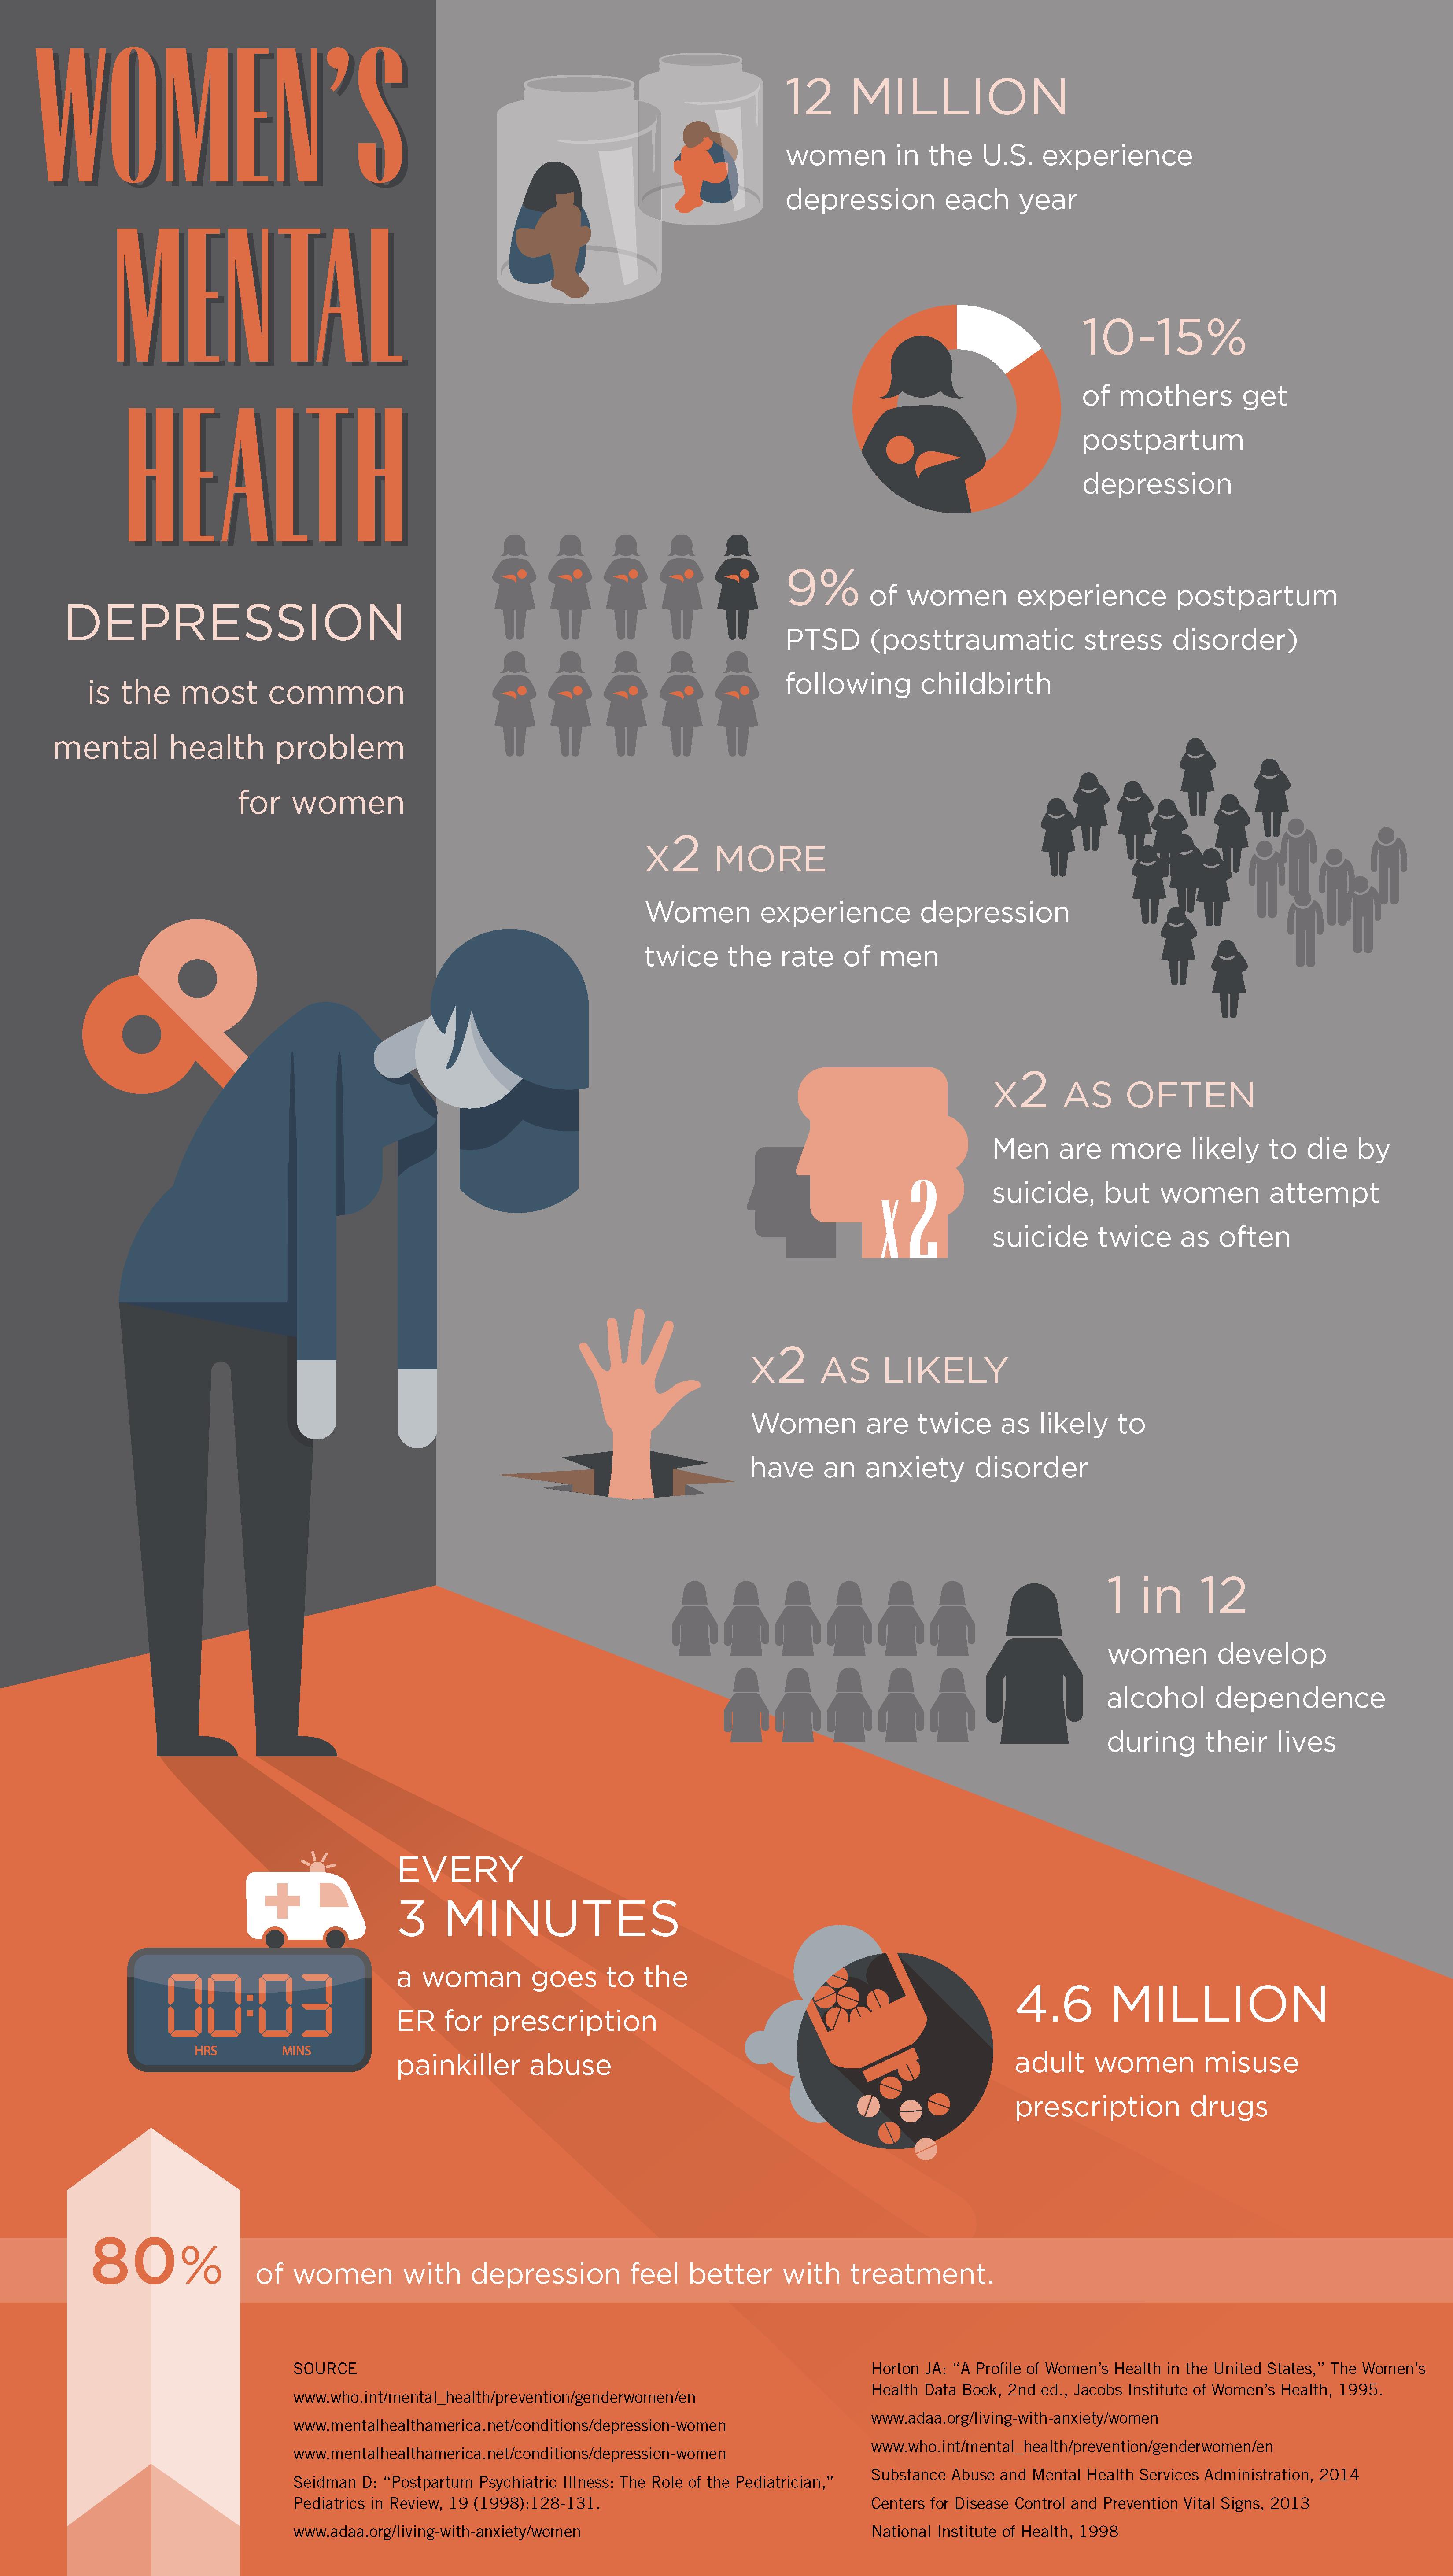 women's mental health infographic